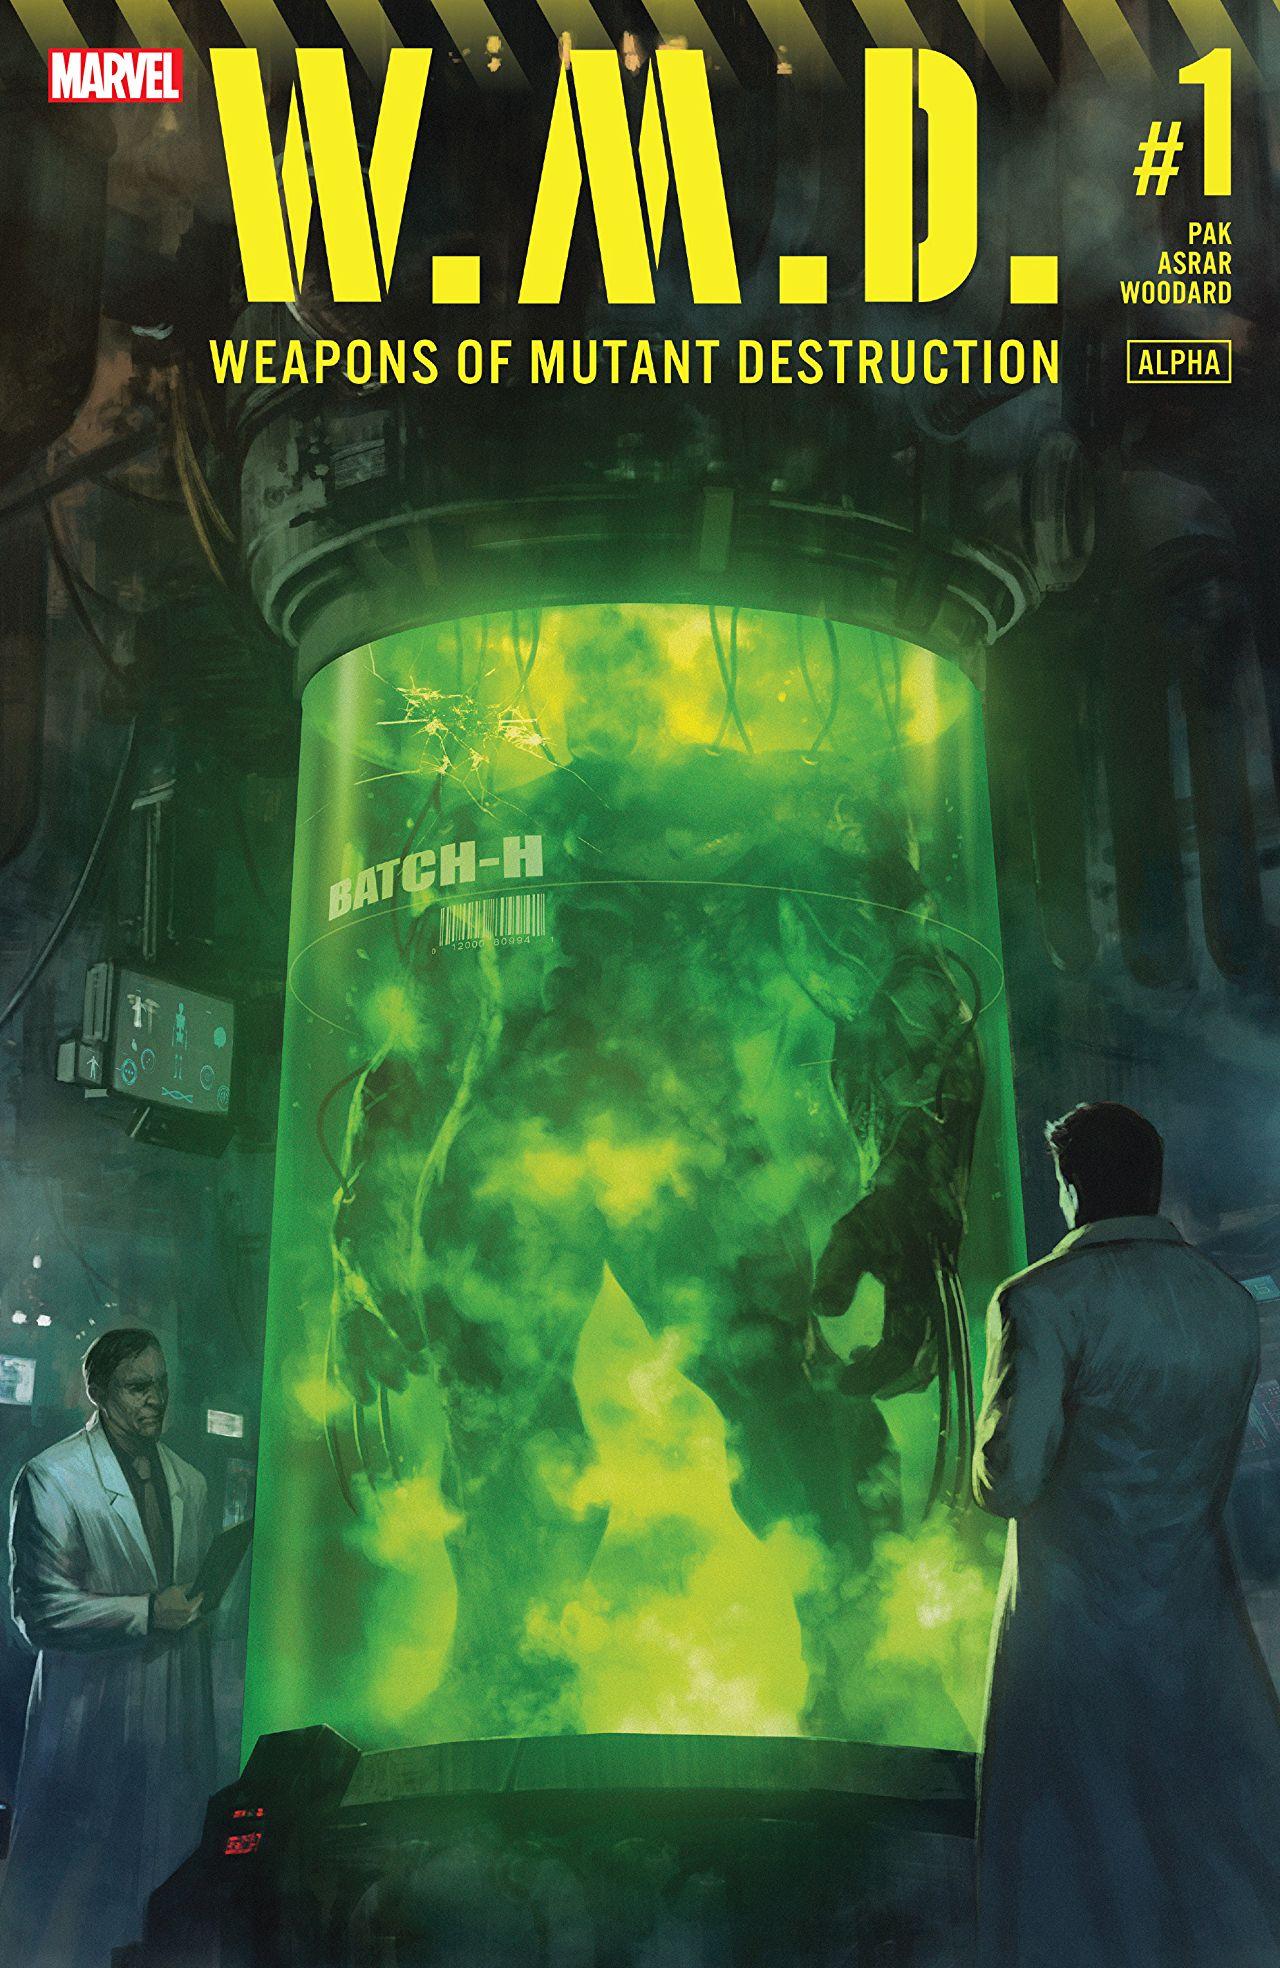 Weapons of Mutant Destruction Alpha #1 Cover